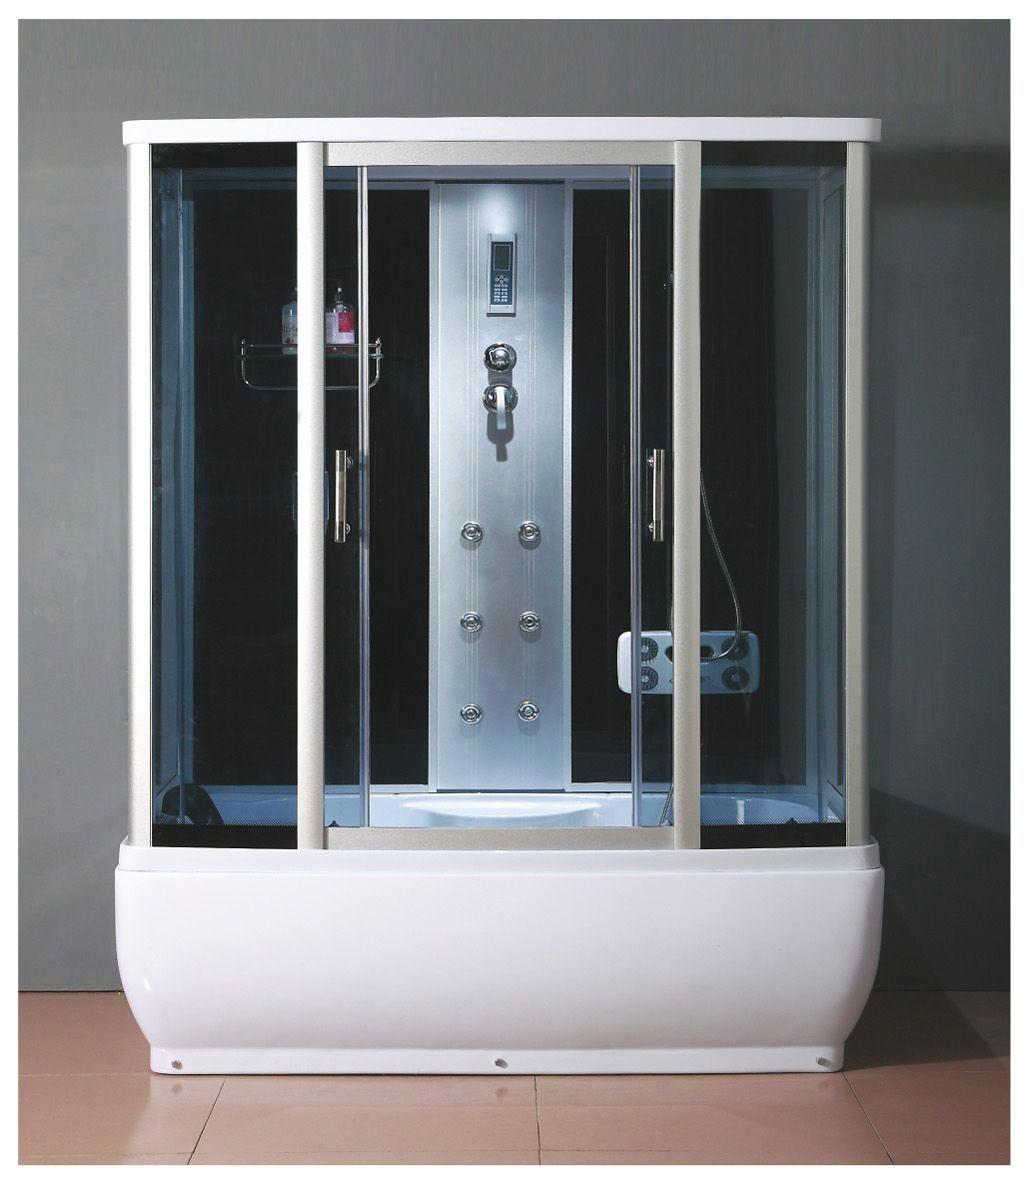 Masážní a sprchový box MILLENIUM 170x85x215cm